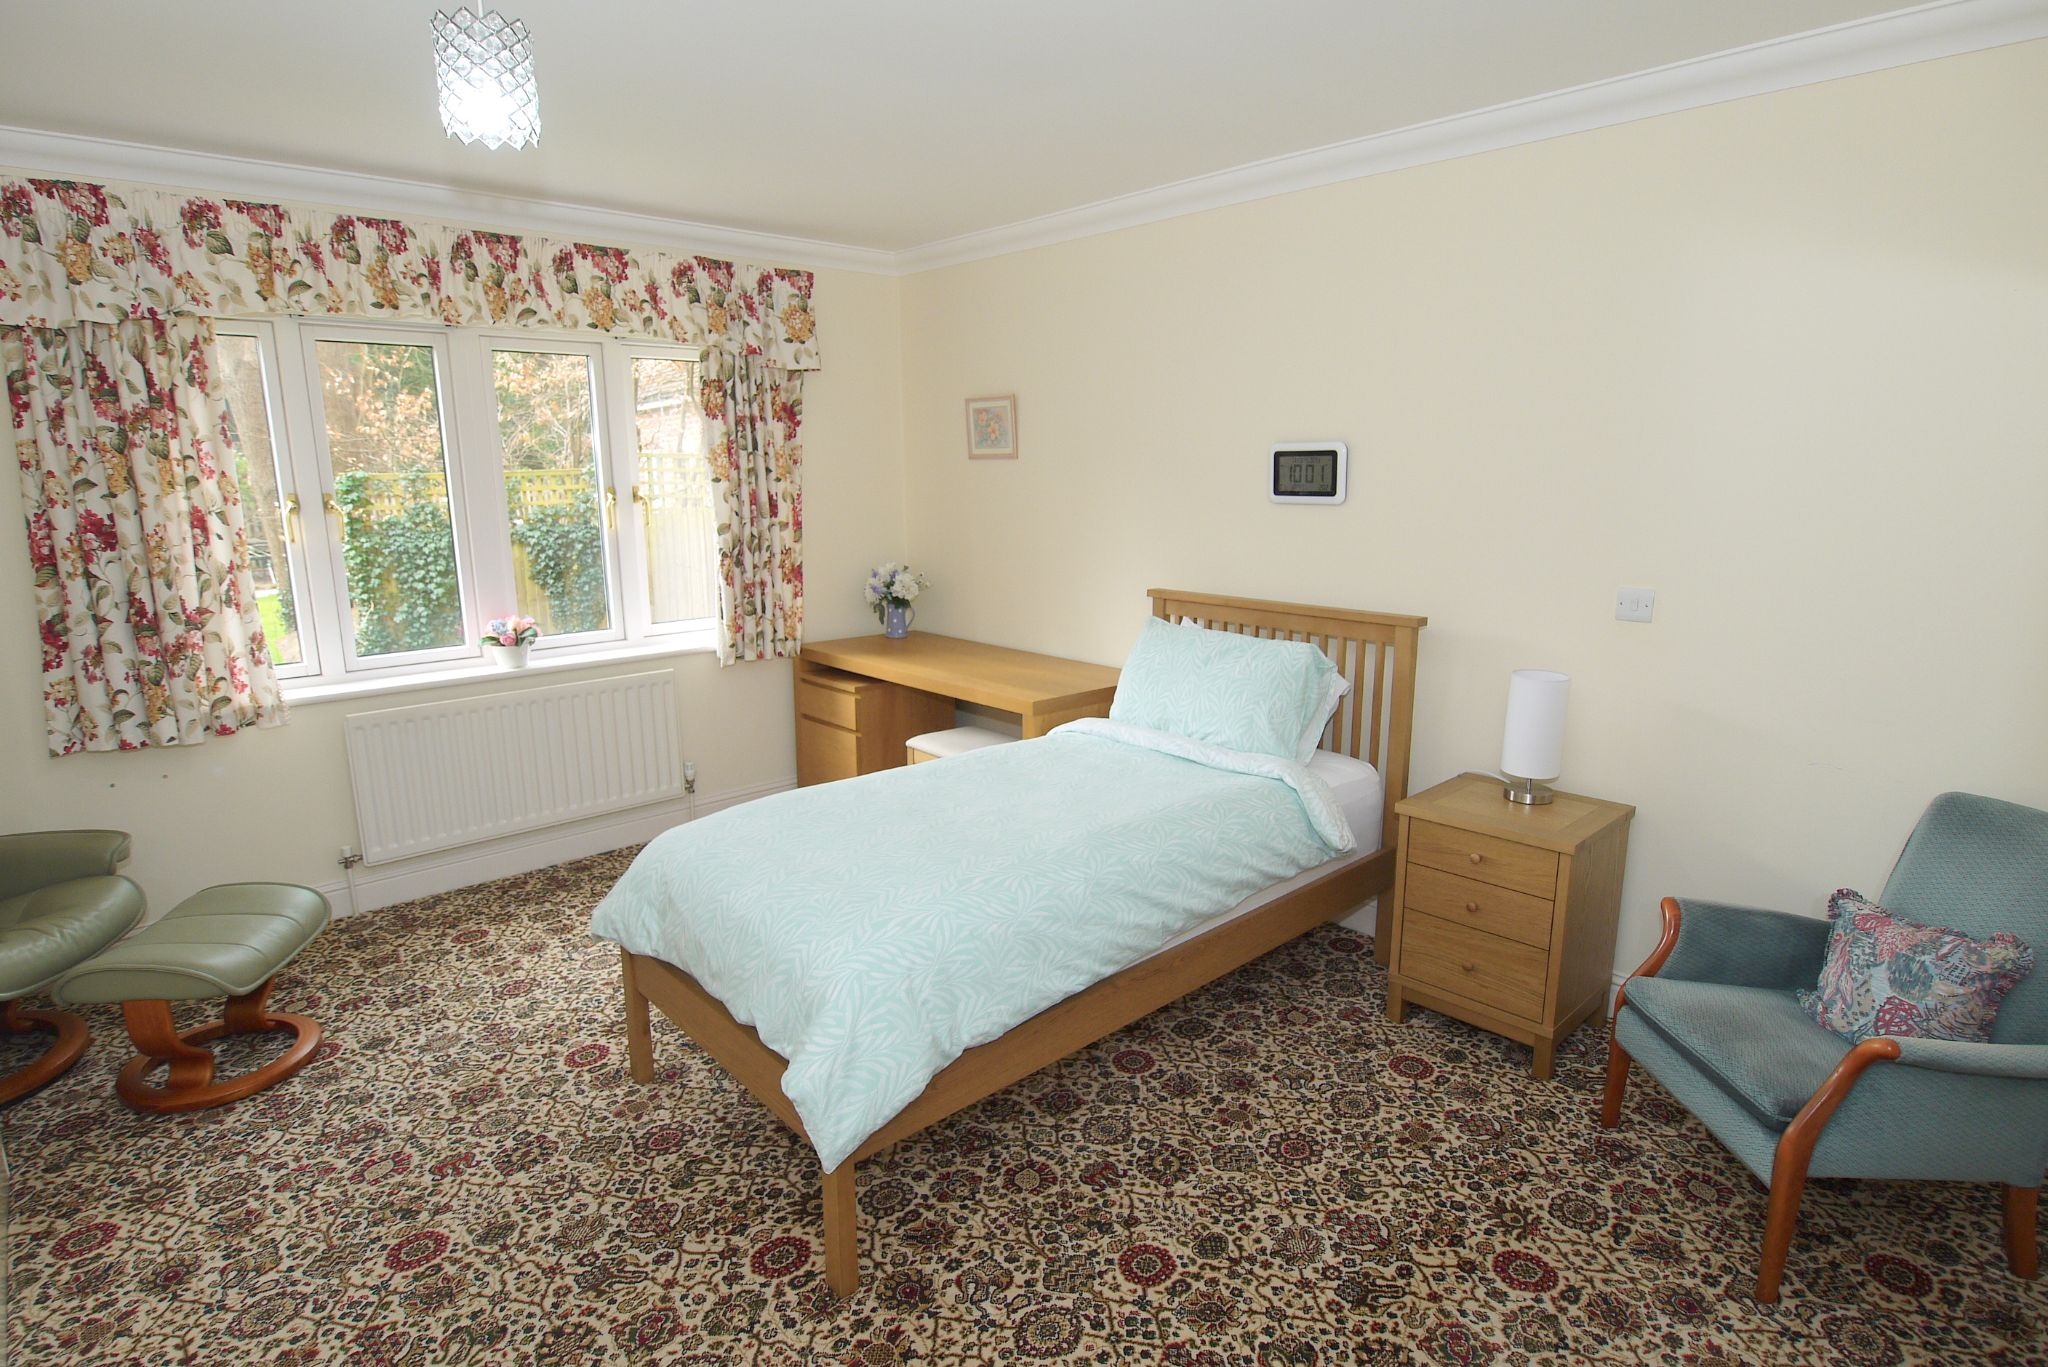 2 bedroom ground floor For Sale in Sevenoaks - Photograph 8